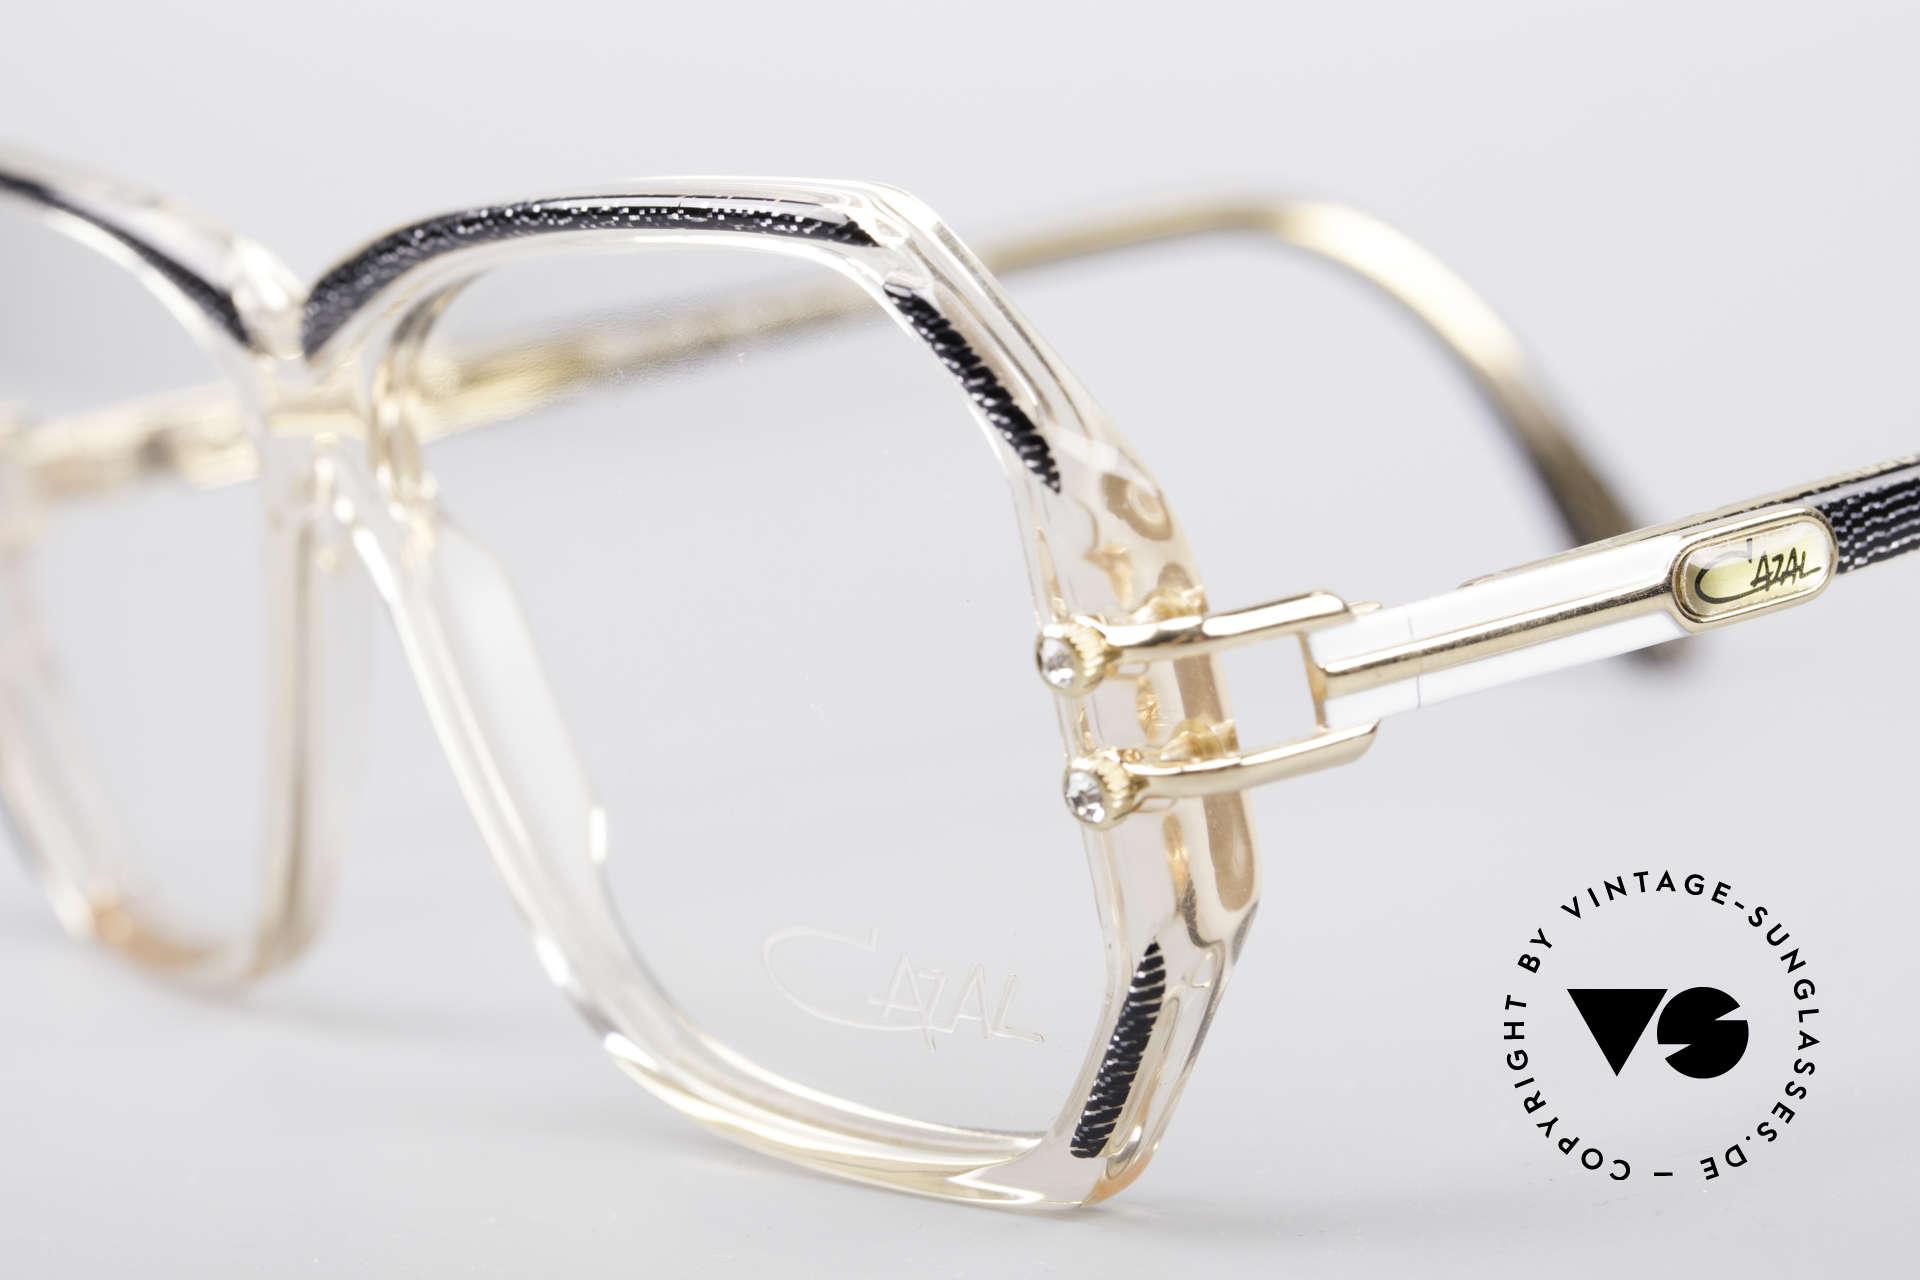 Cazal 169 Small Designer Frame, with some tiny rhinestones as ornamental screws, Made for Women